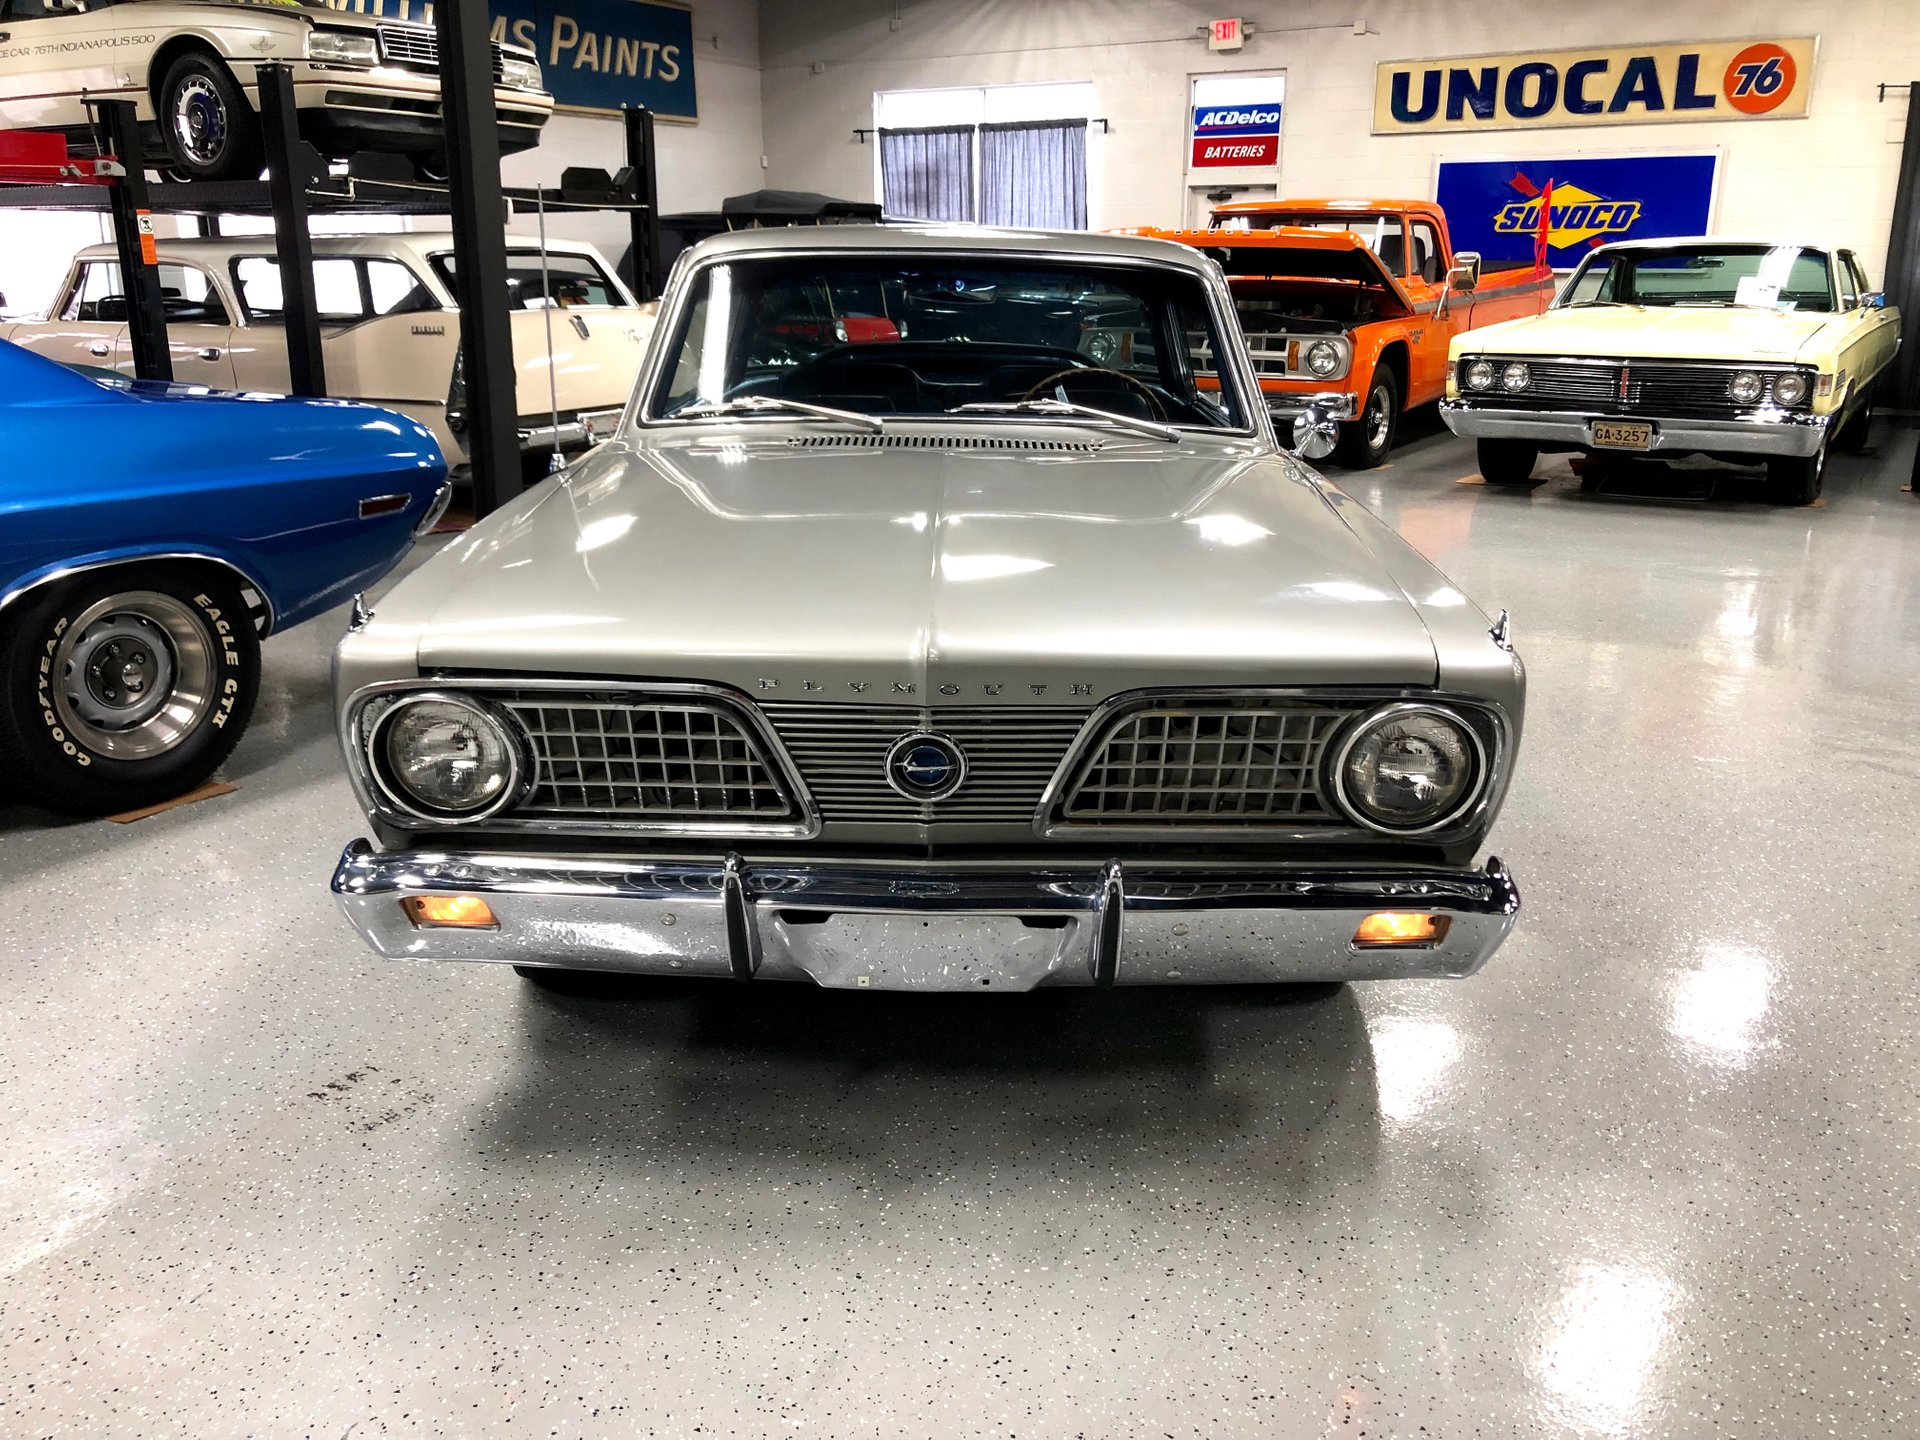 1966 Plymouth Barracuda for sale #109067   MCG